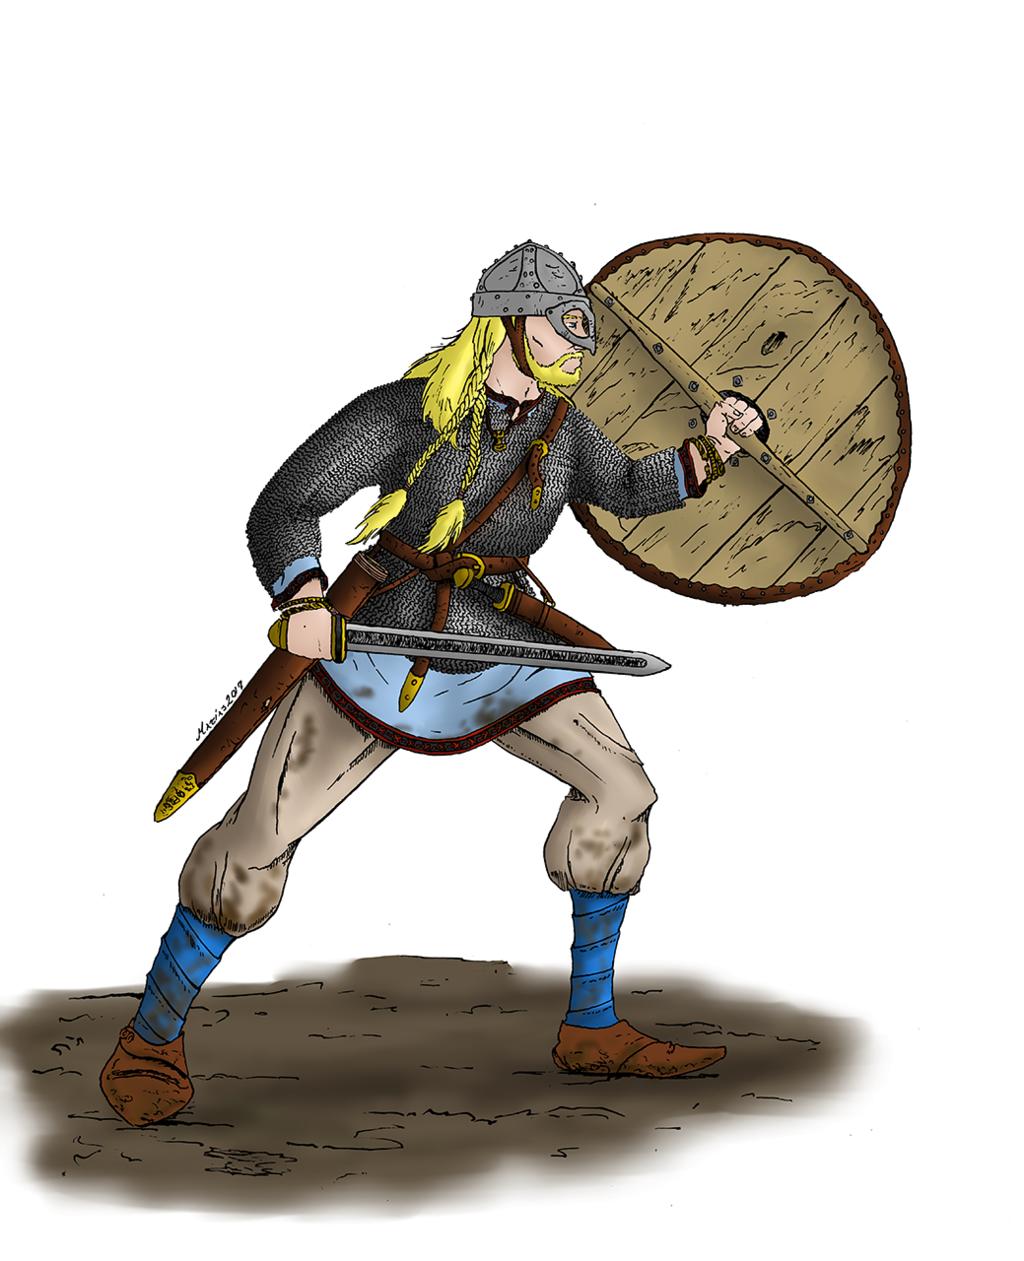 Uthred of Bebbanburg